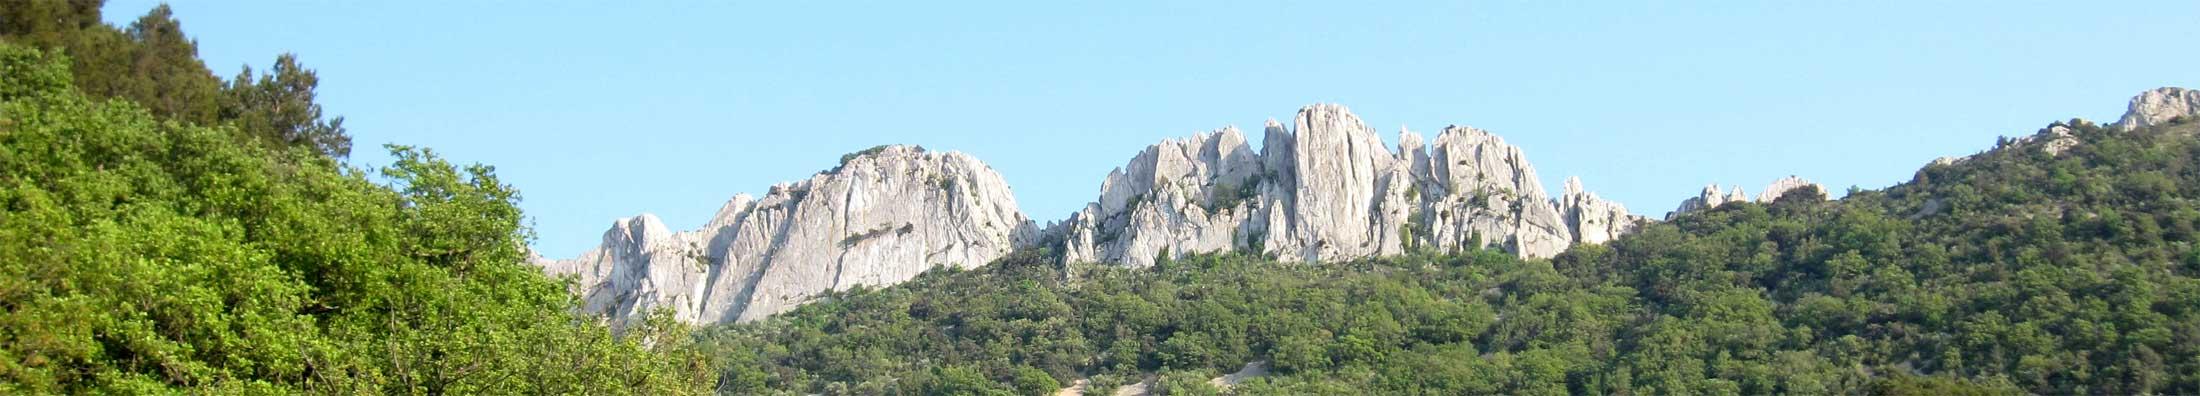 Beste Bed and Breakfast - Frankrijk - Provence-Alpes-Côte d'Azur - Vaucluse - Piolenc - Les Hauts de Piolenc - topfoto